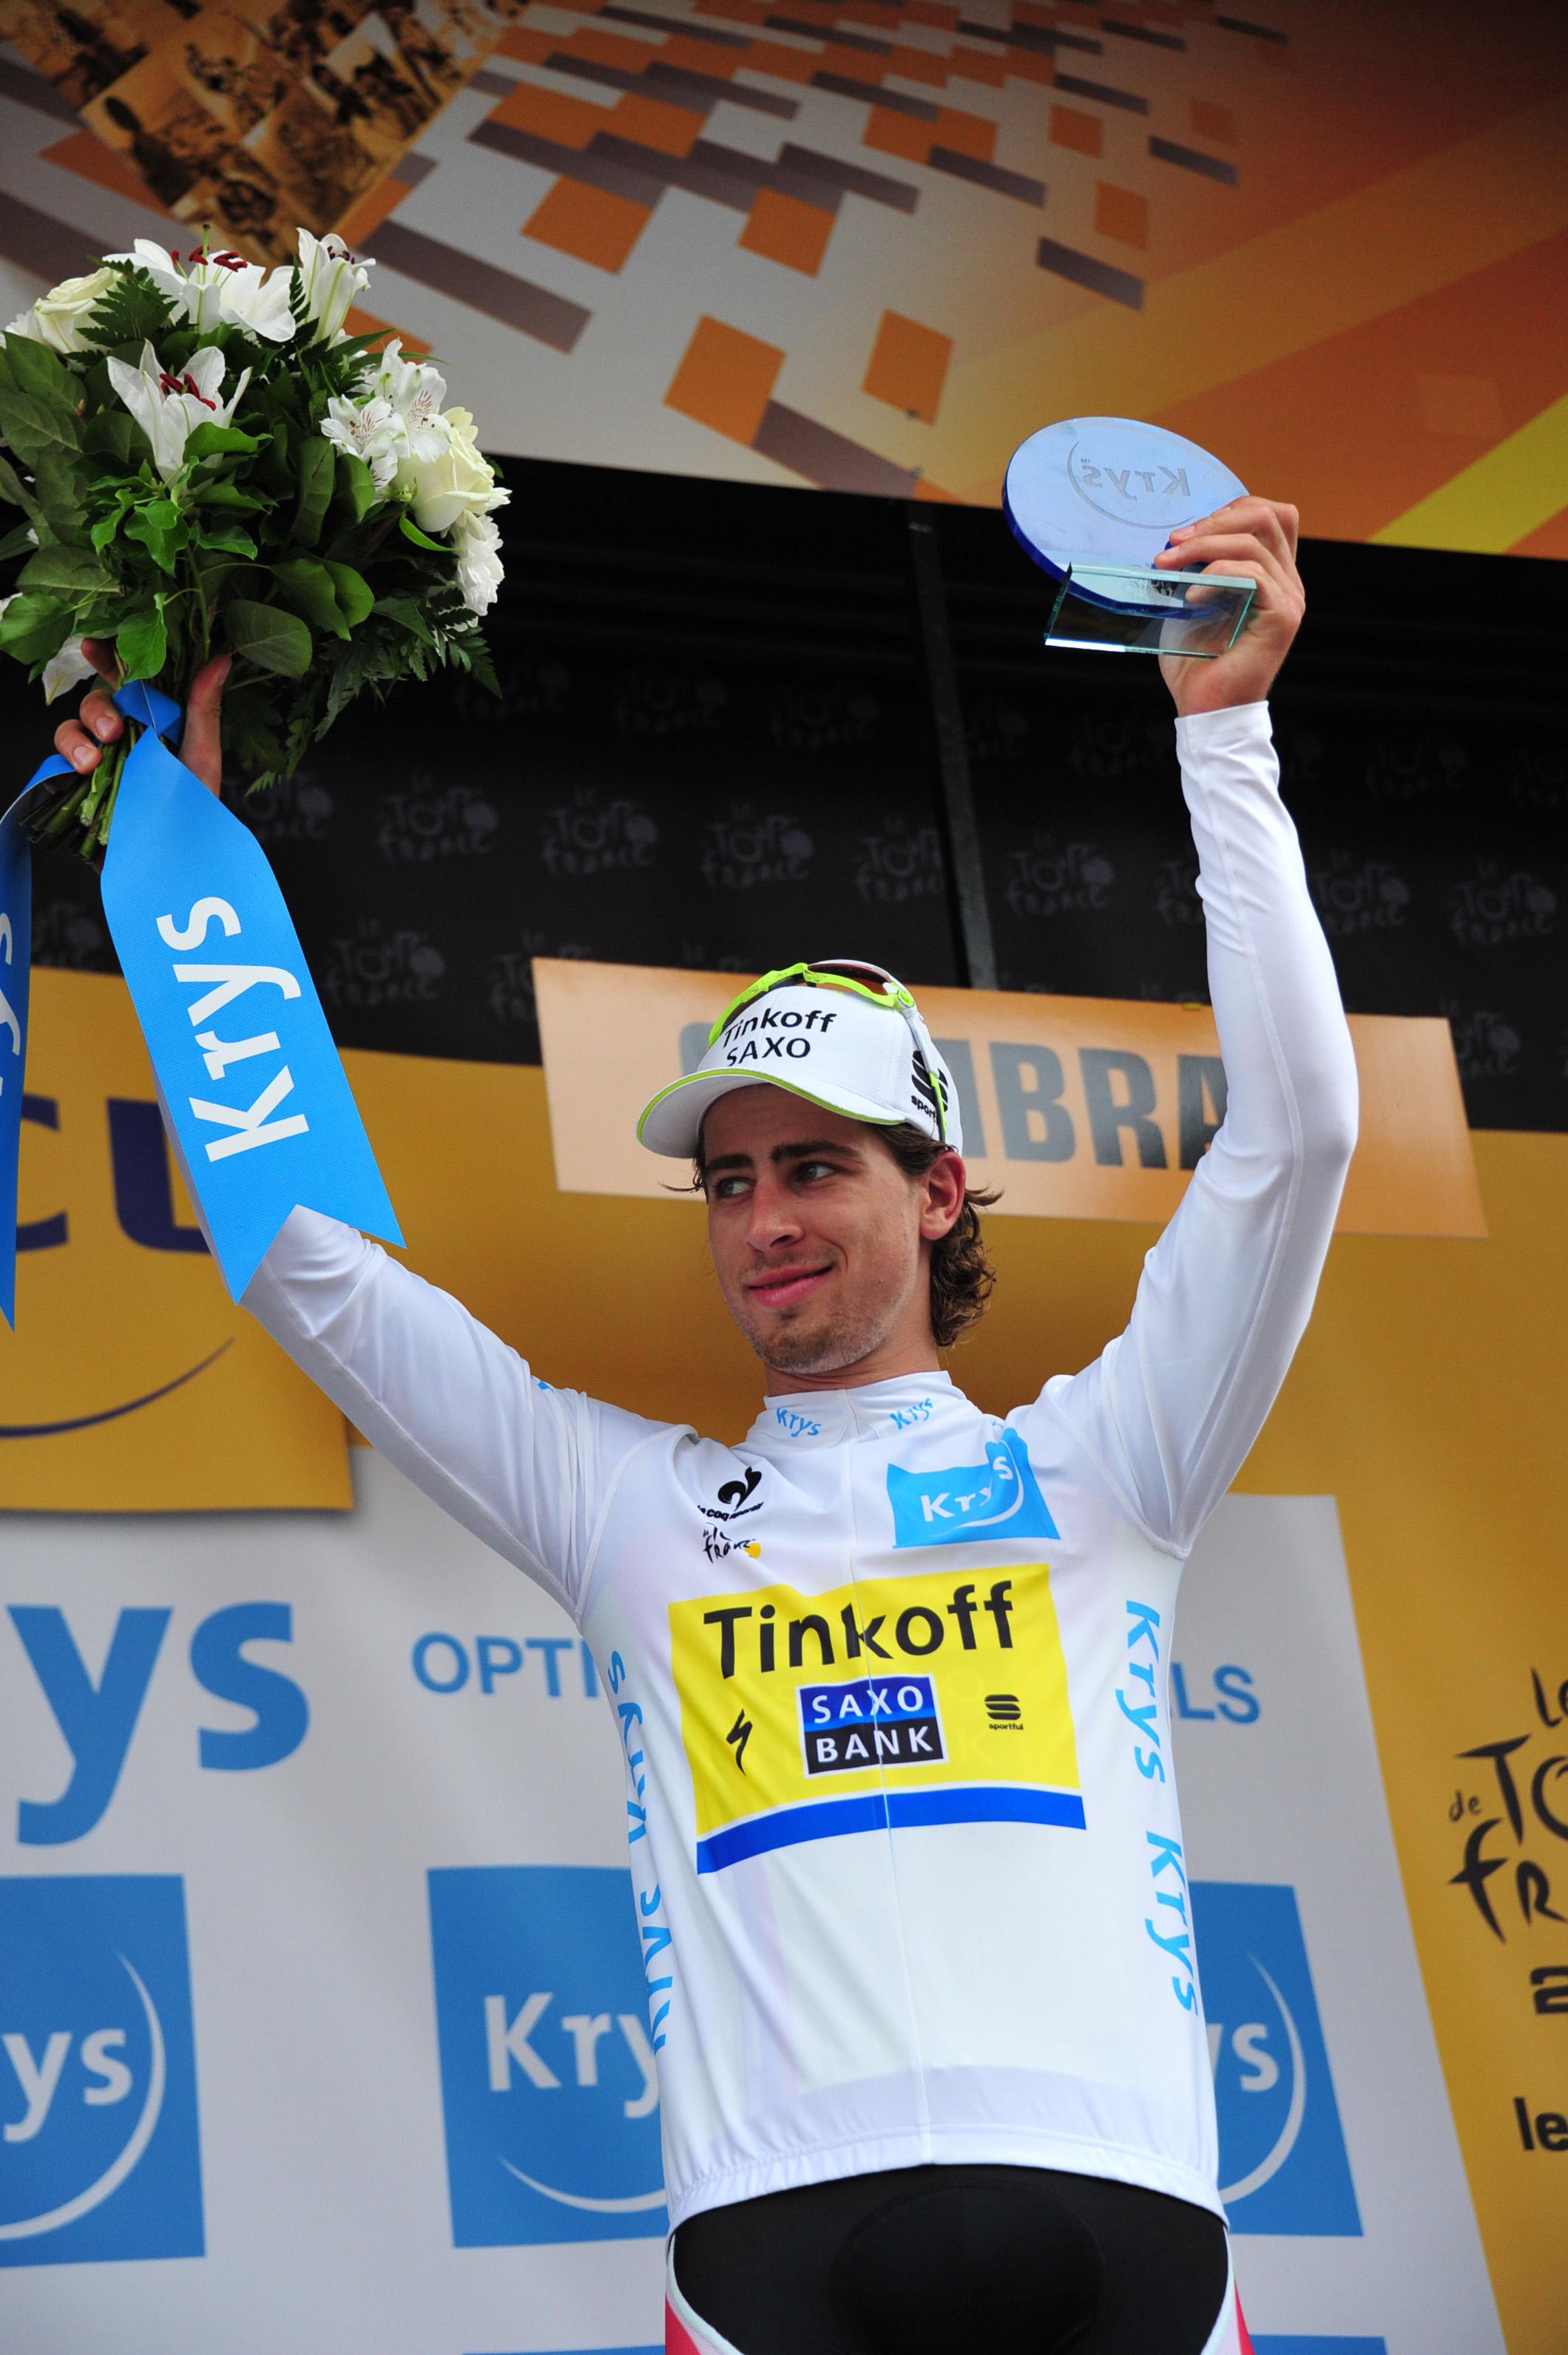 Peter Sagan war Alberto Contadors Motor auf dem schwierigen Gelände. (pic: Sirotti)